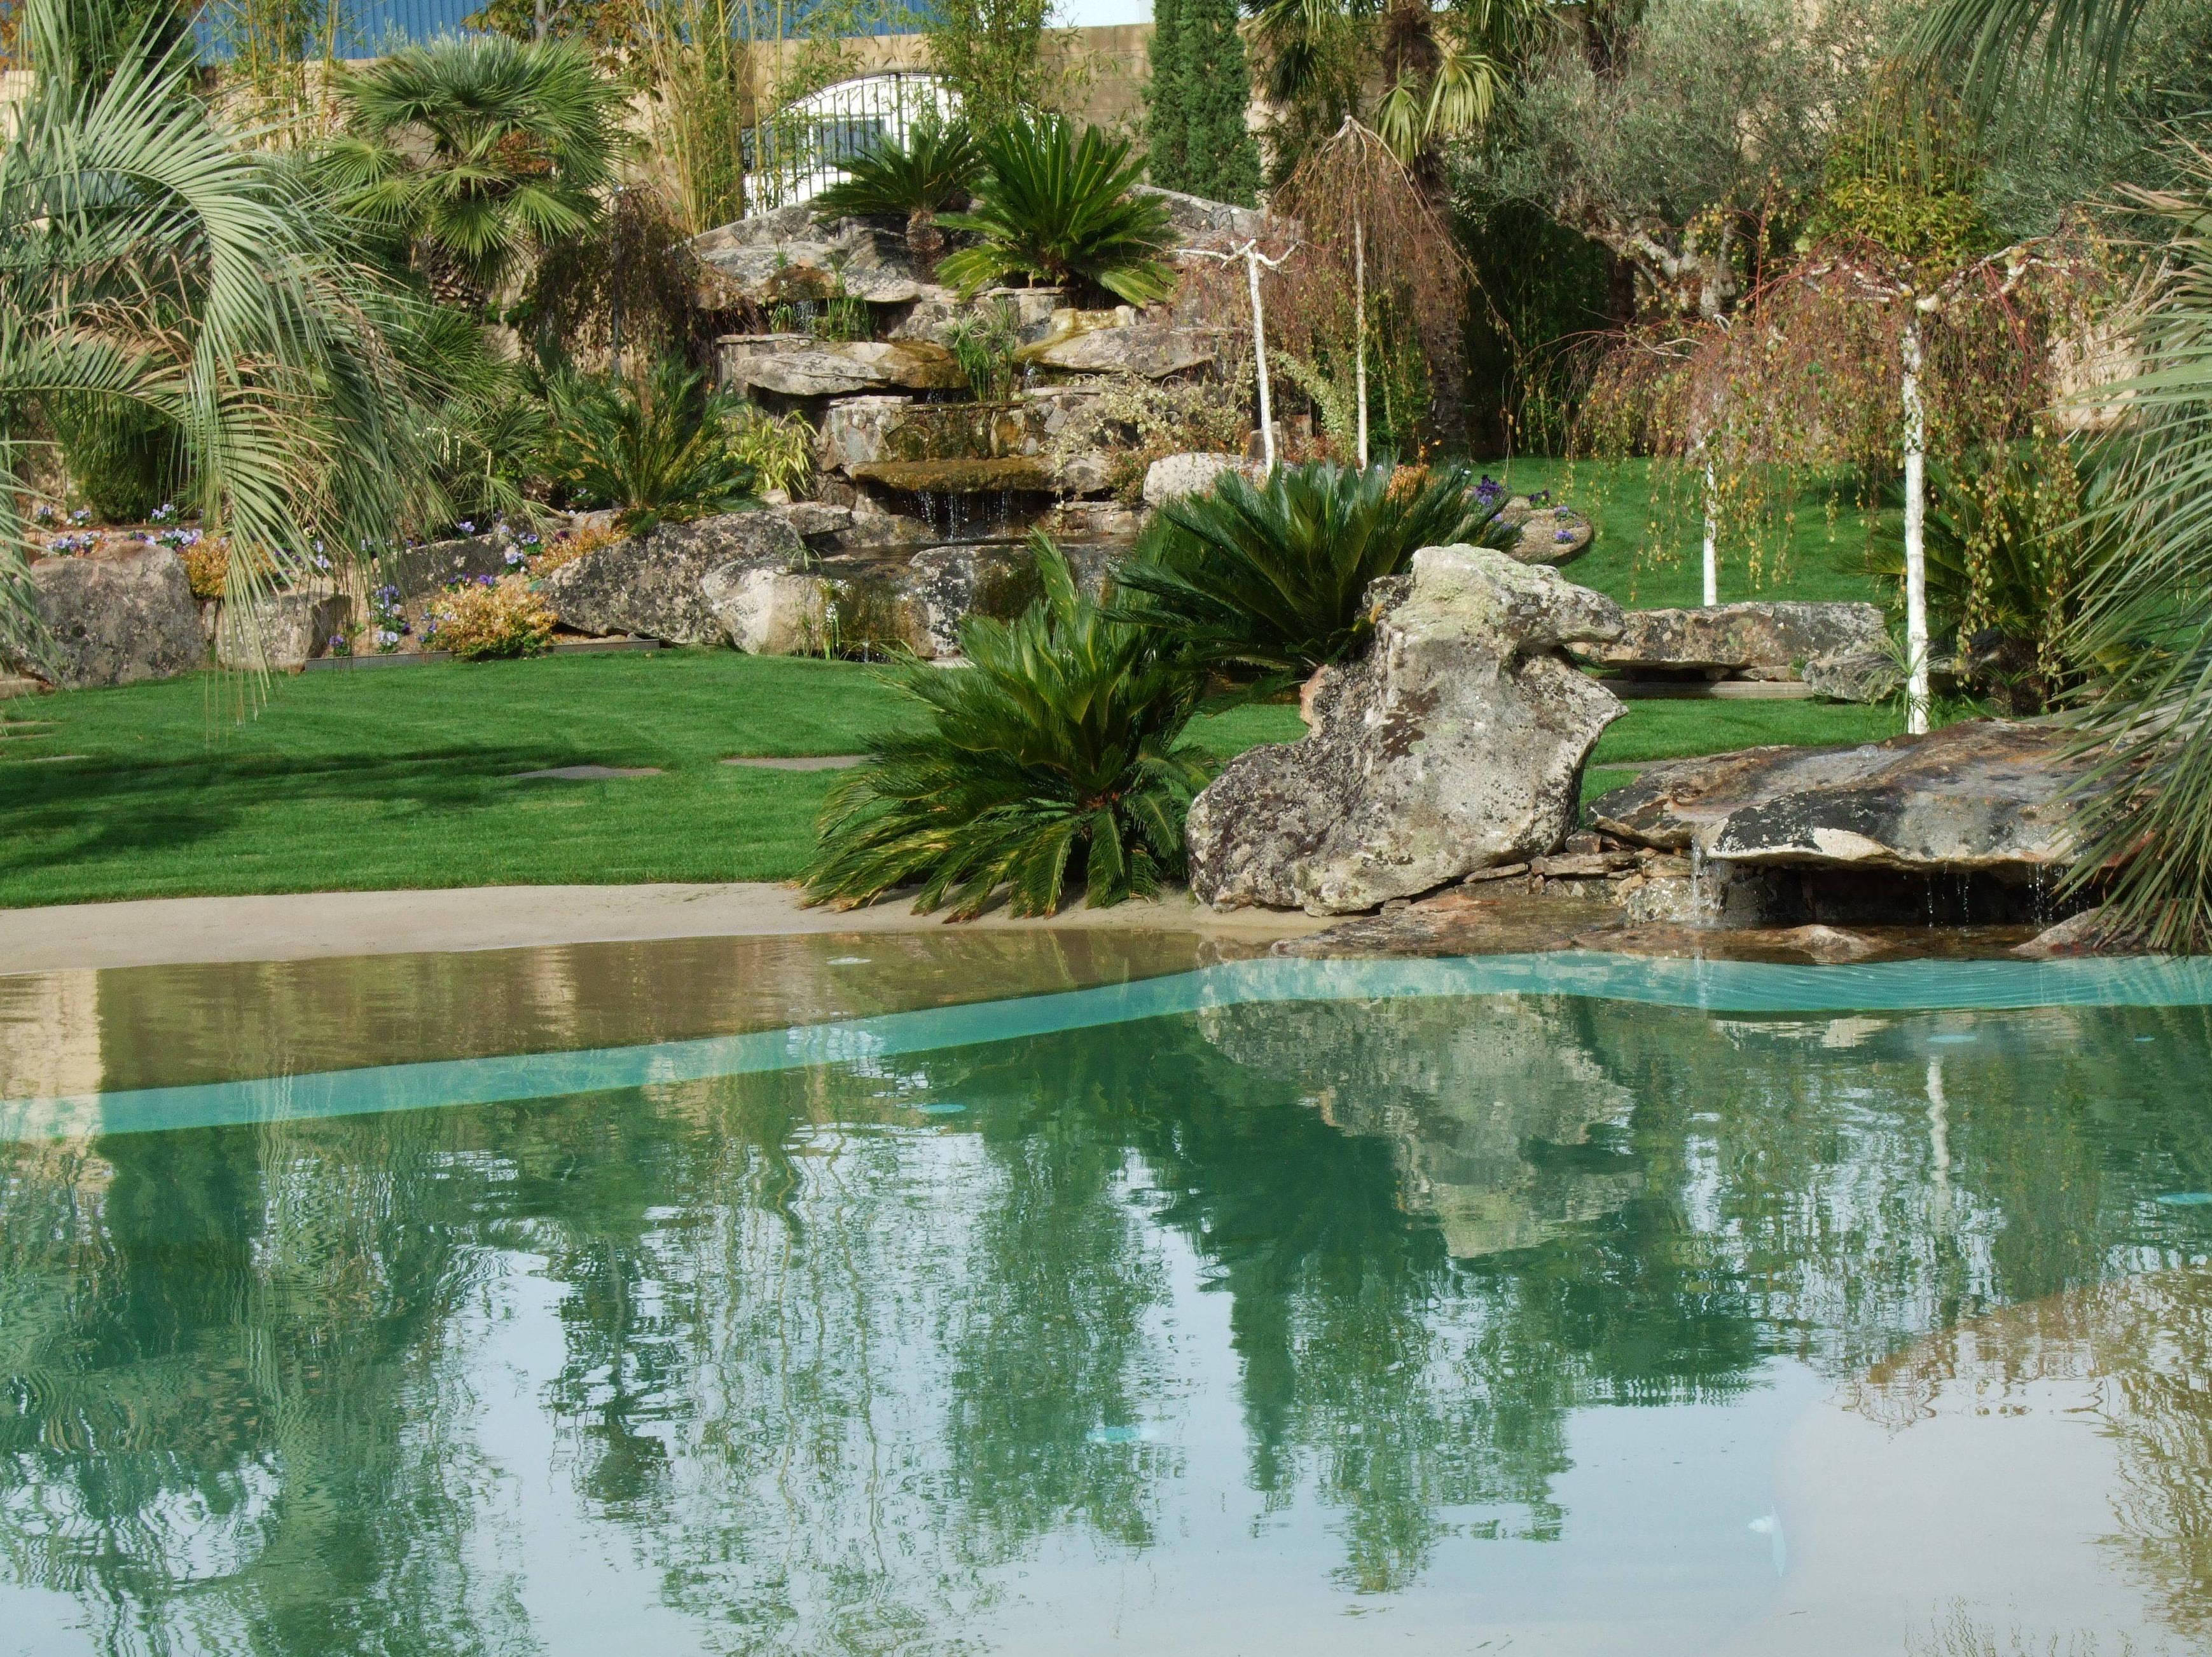 Foto 24 de Instalación de piscinas en Leganés | Lallana Pol